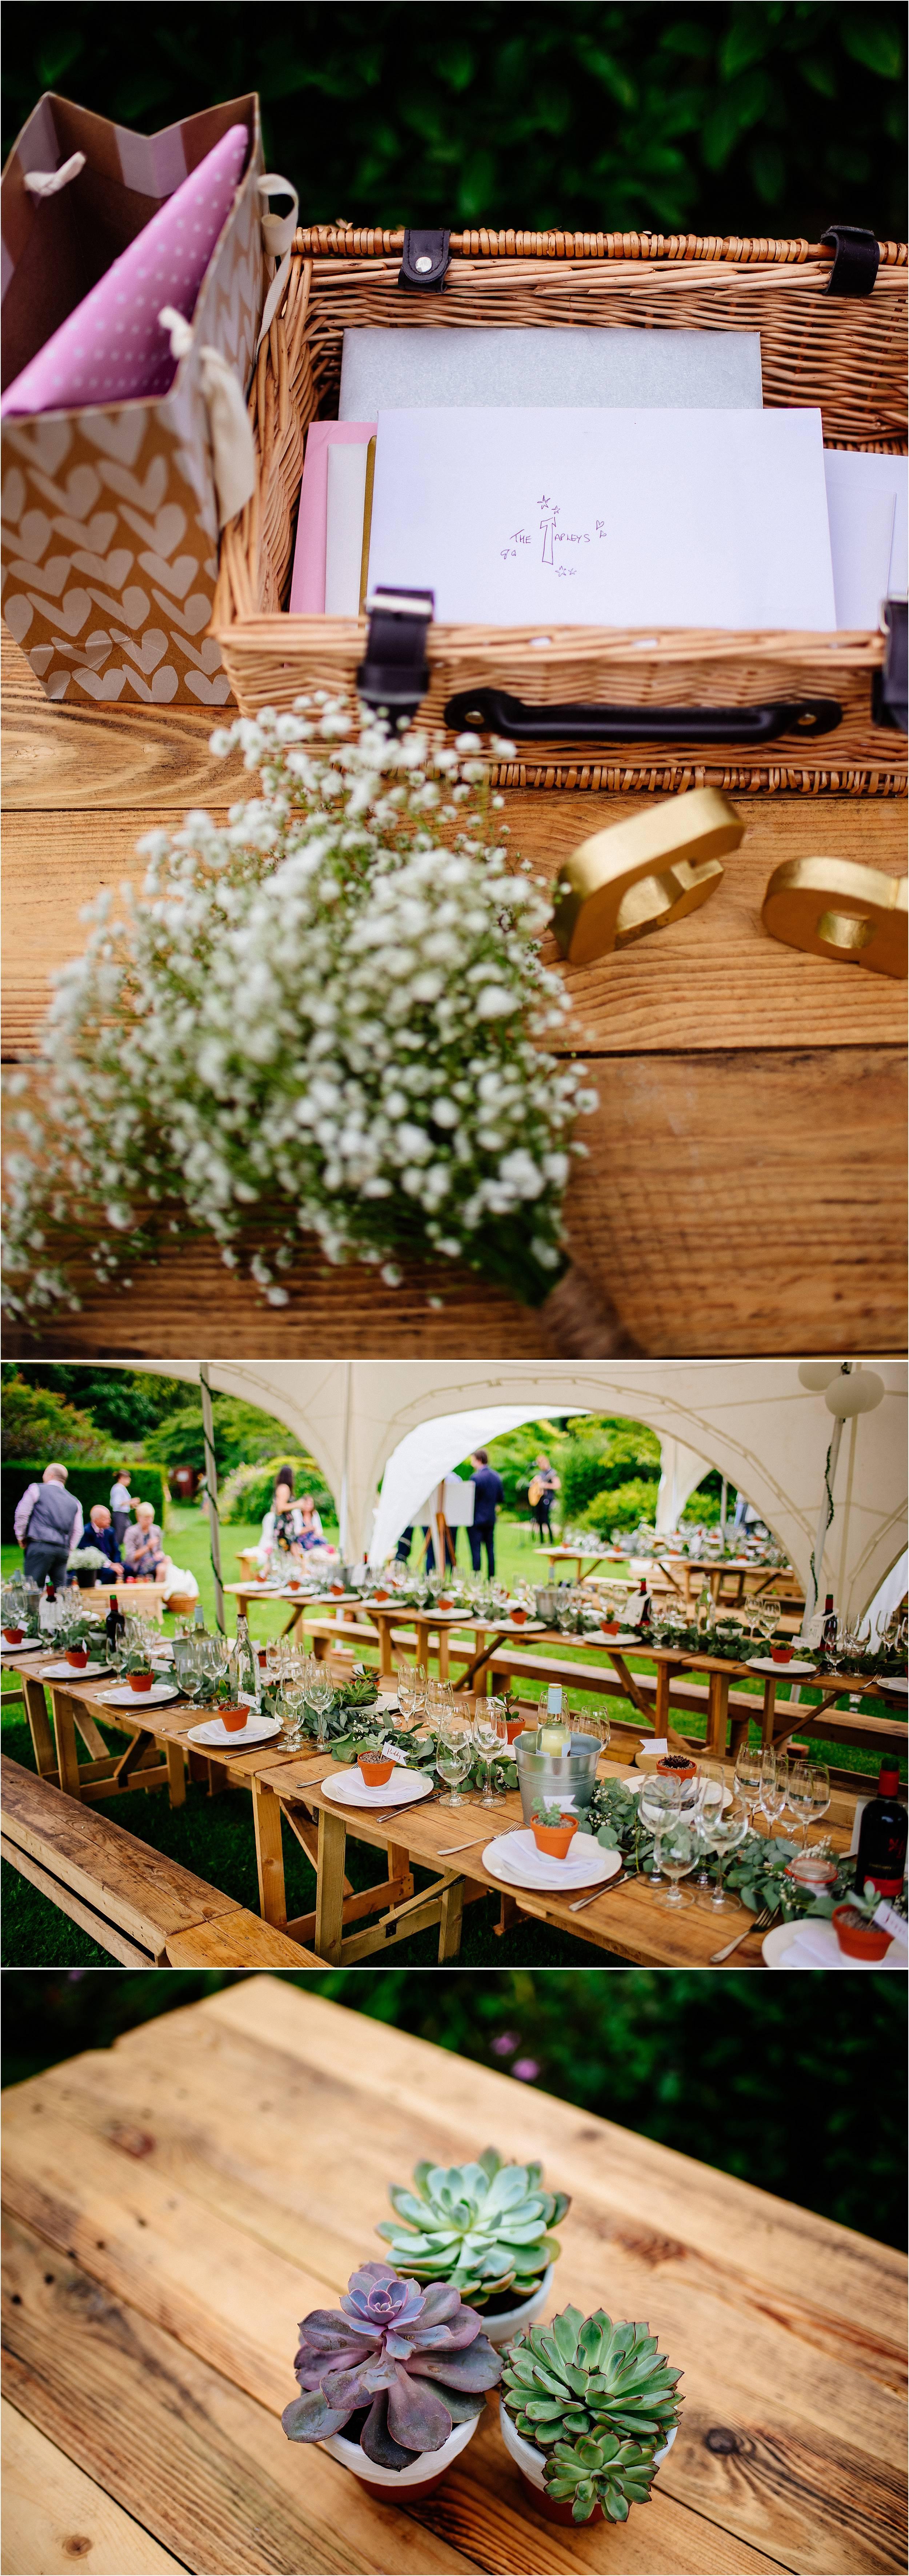 Barnsdale Gardens Wedding Photographer_0040.jpg